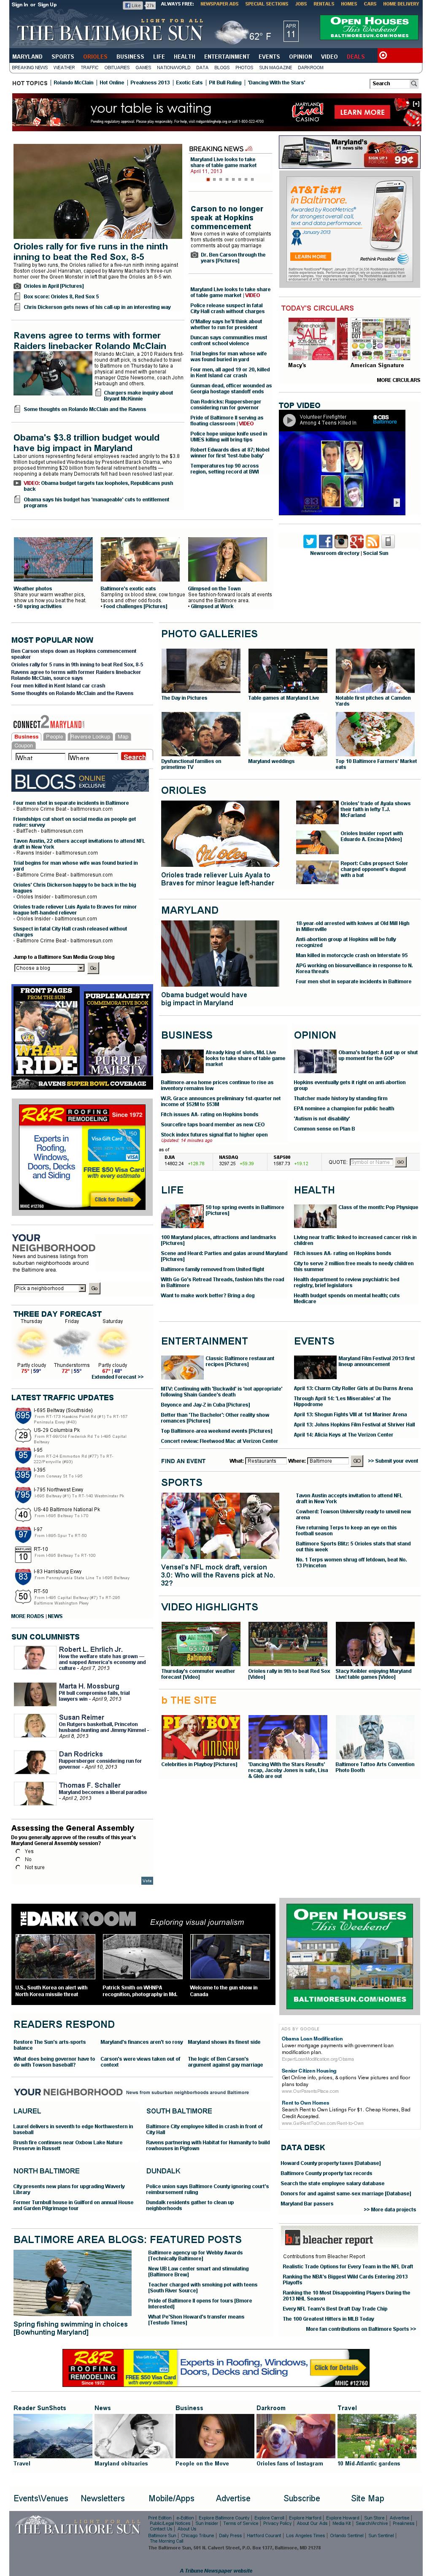 The Baltimore Sun at Thursday April 11, 2013, 10:01 a.m. UTC